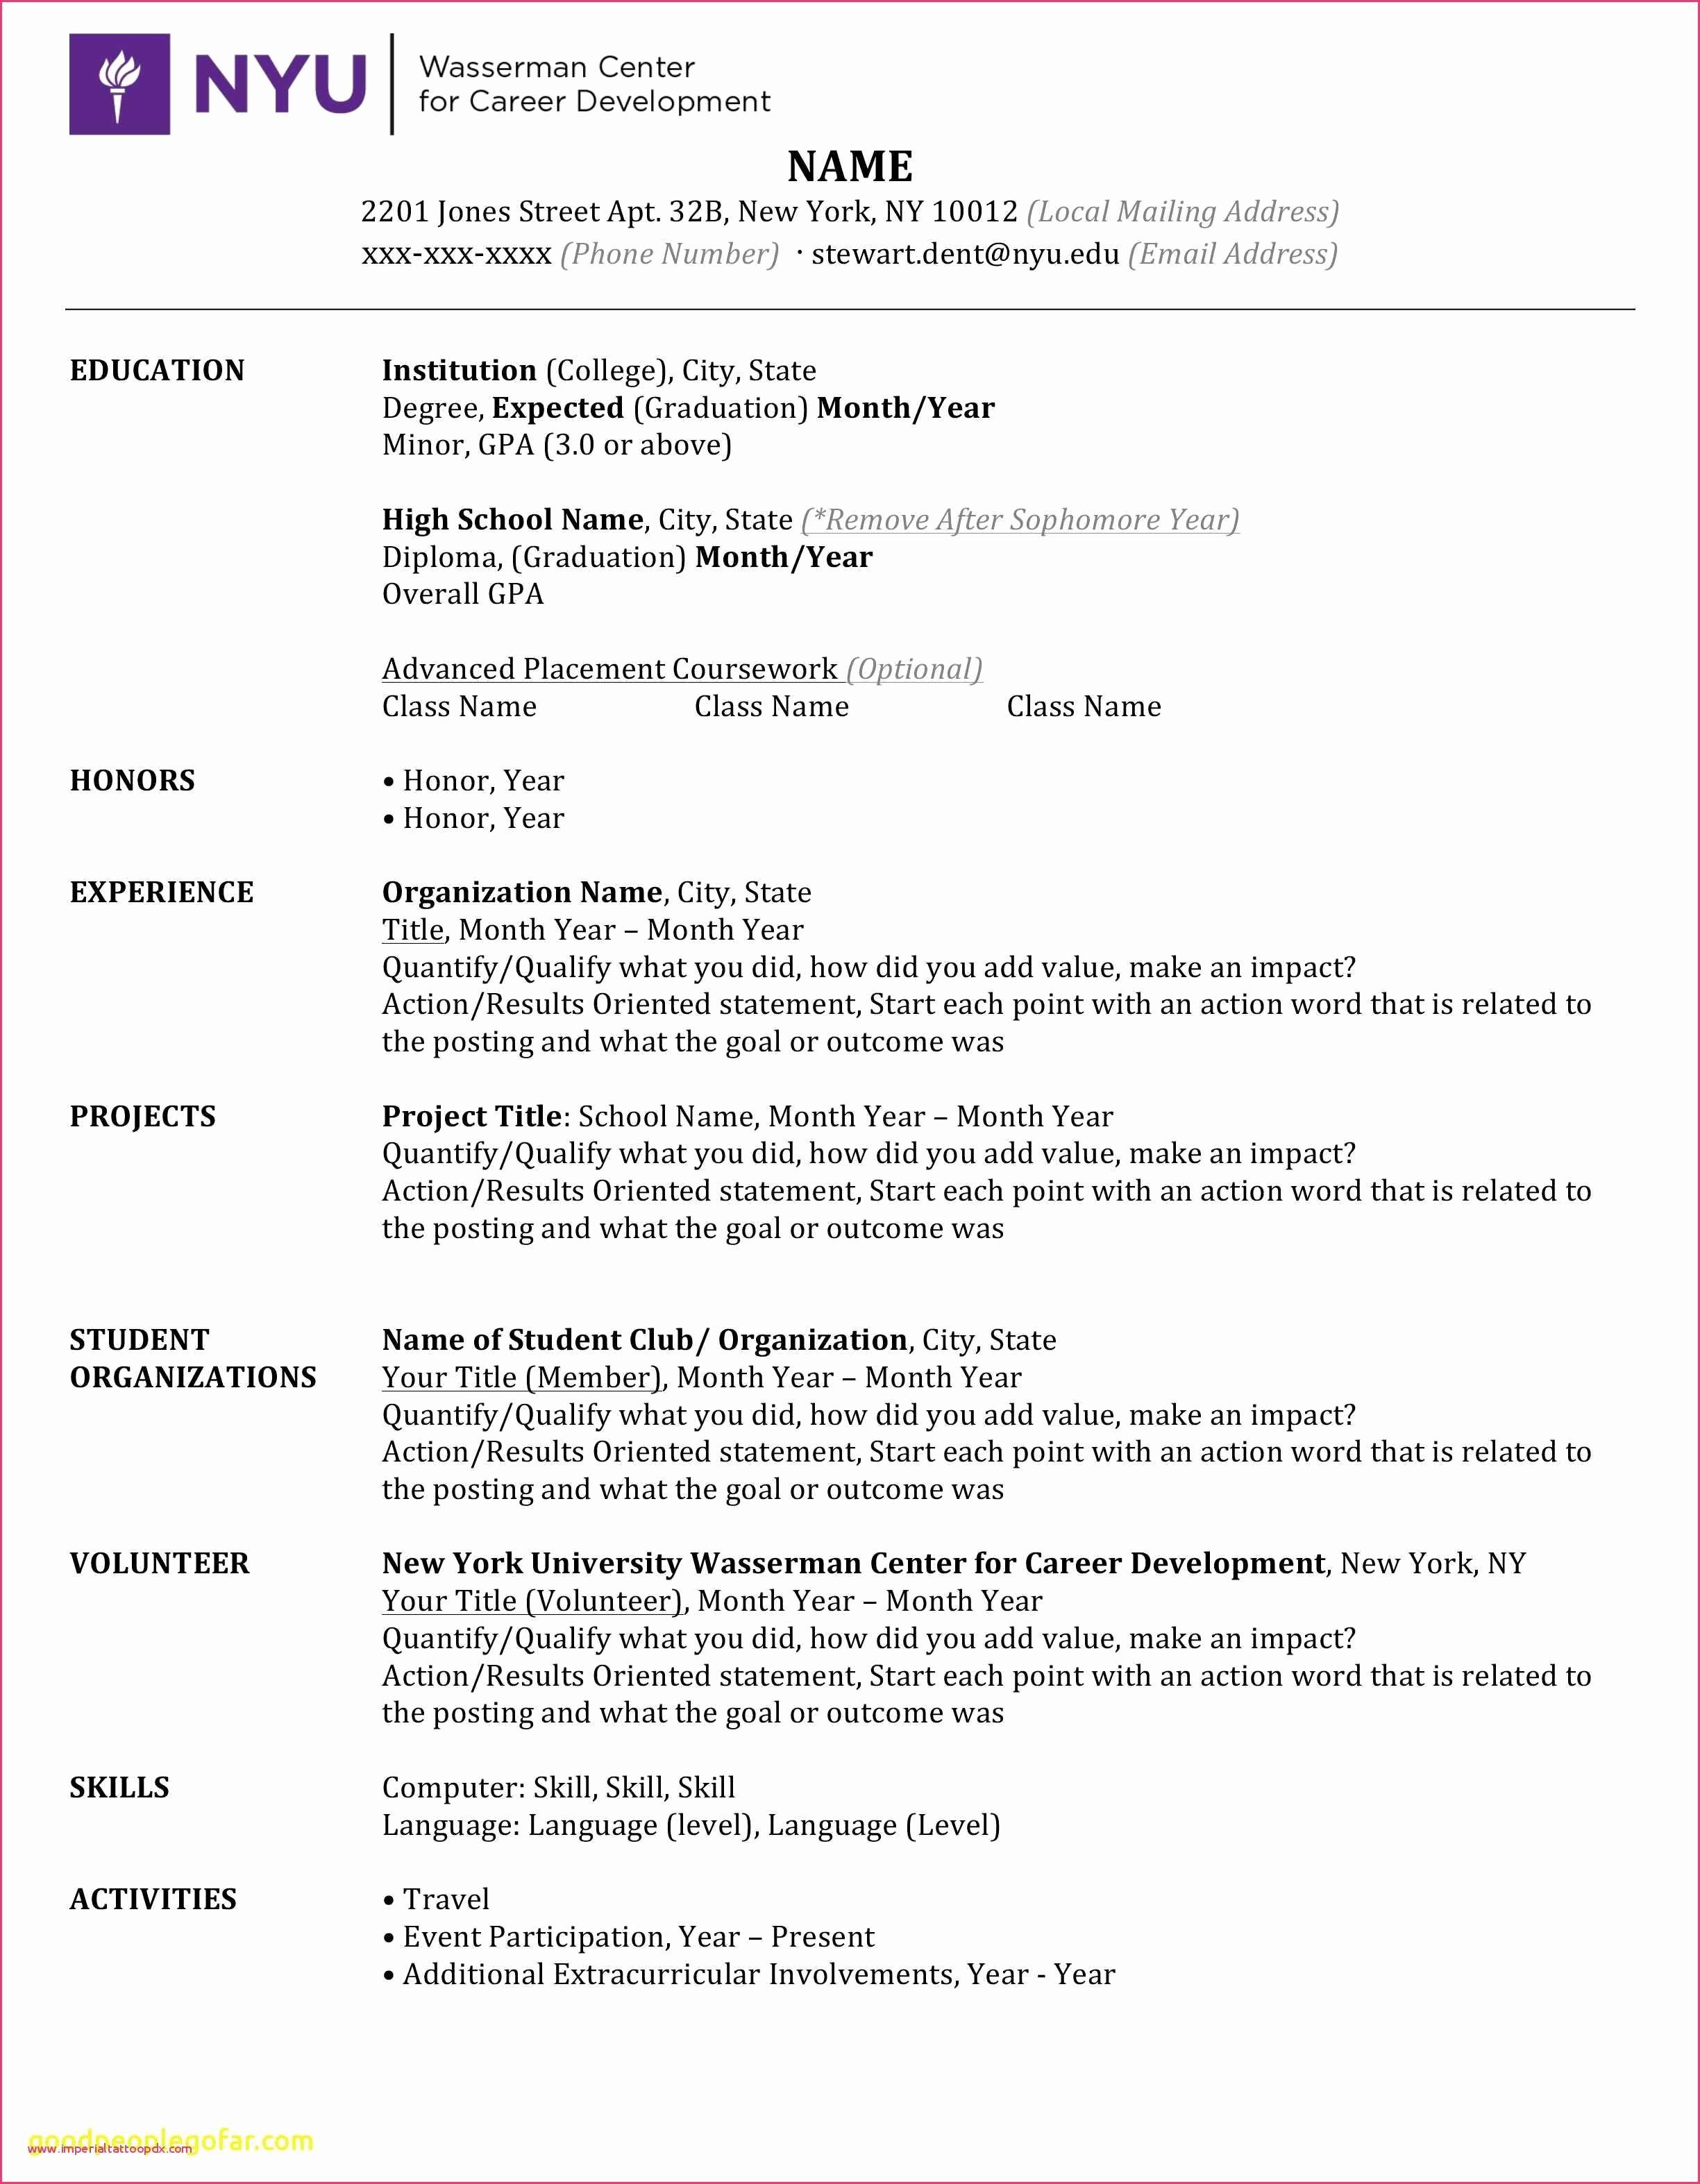 Microsoft Word 2007 Resume Template Unique 46 Resume Template Download for Microsoft Word 2007